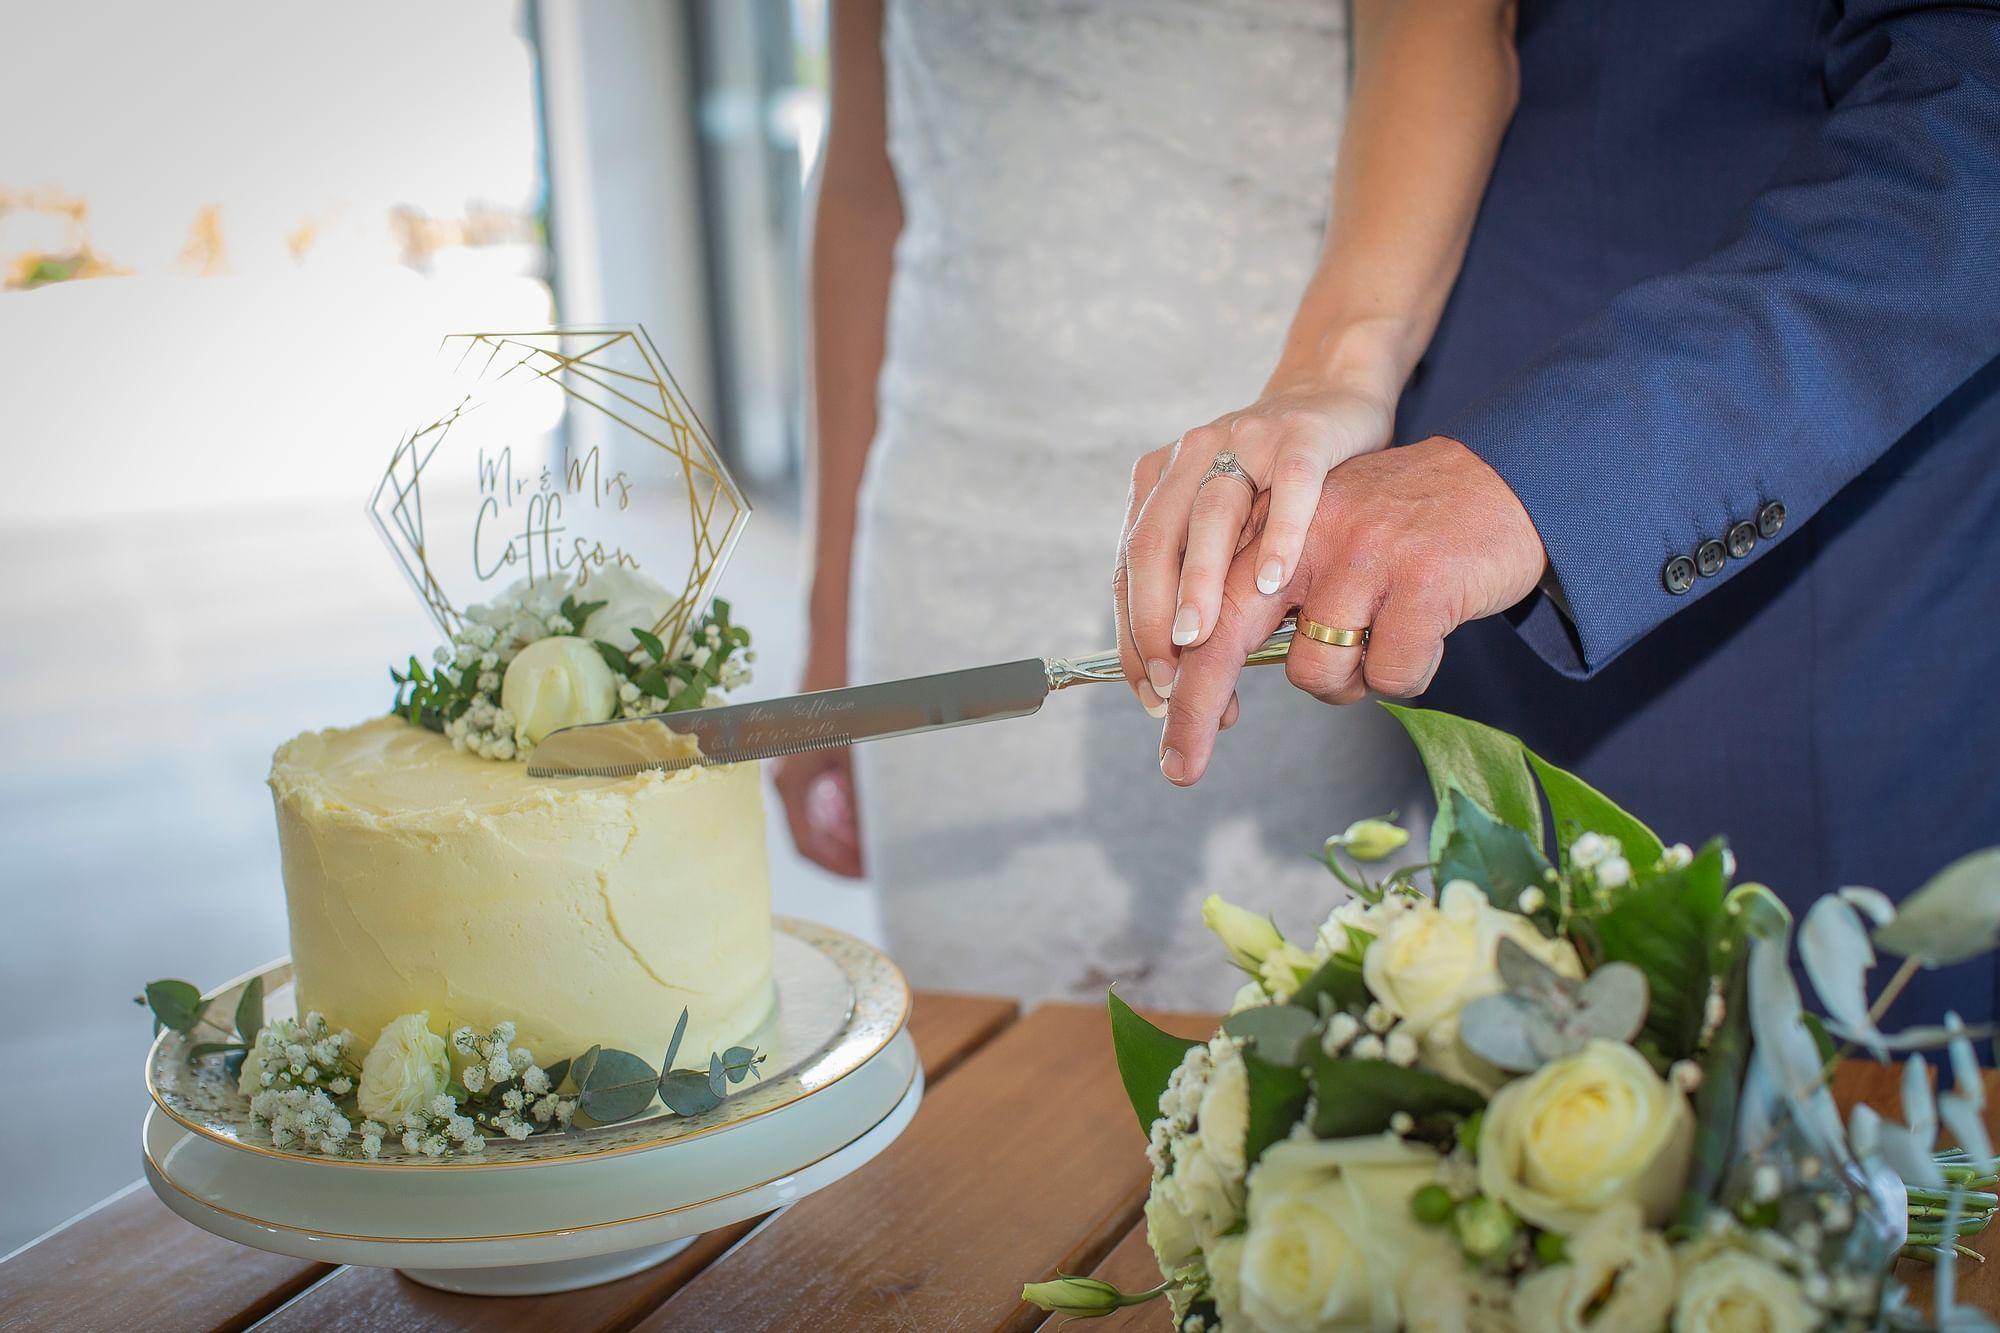 Couple cutting the wedding cake at Daydream Island Resort